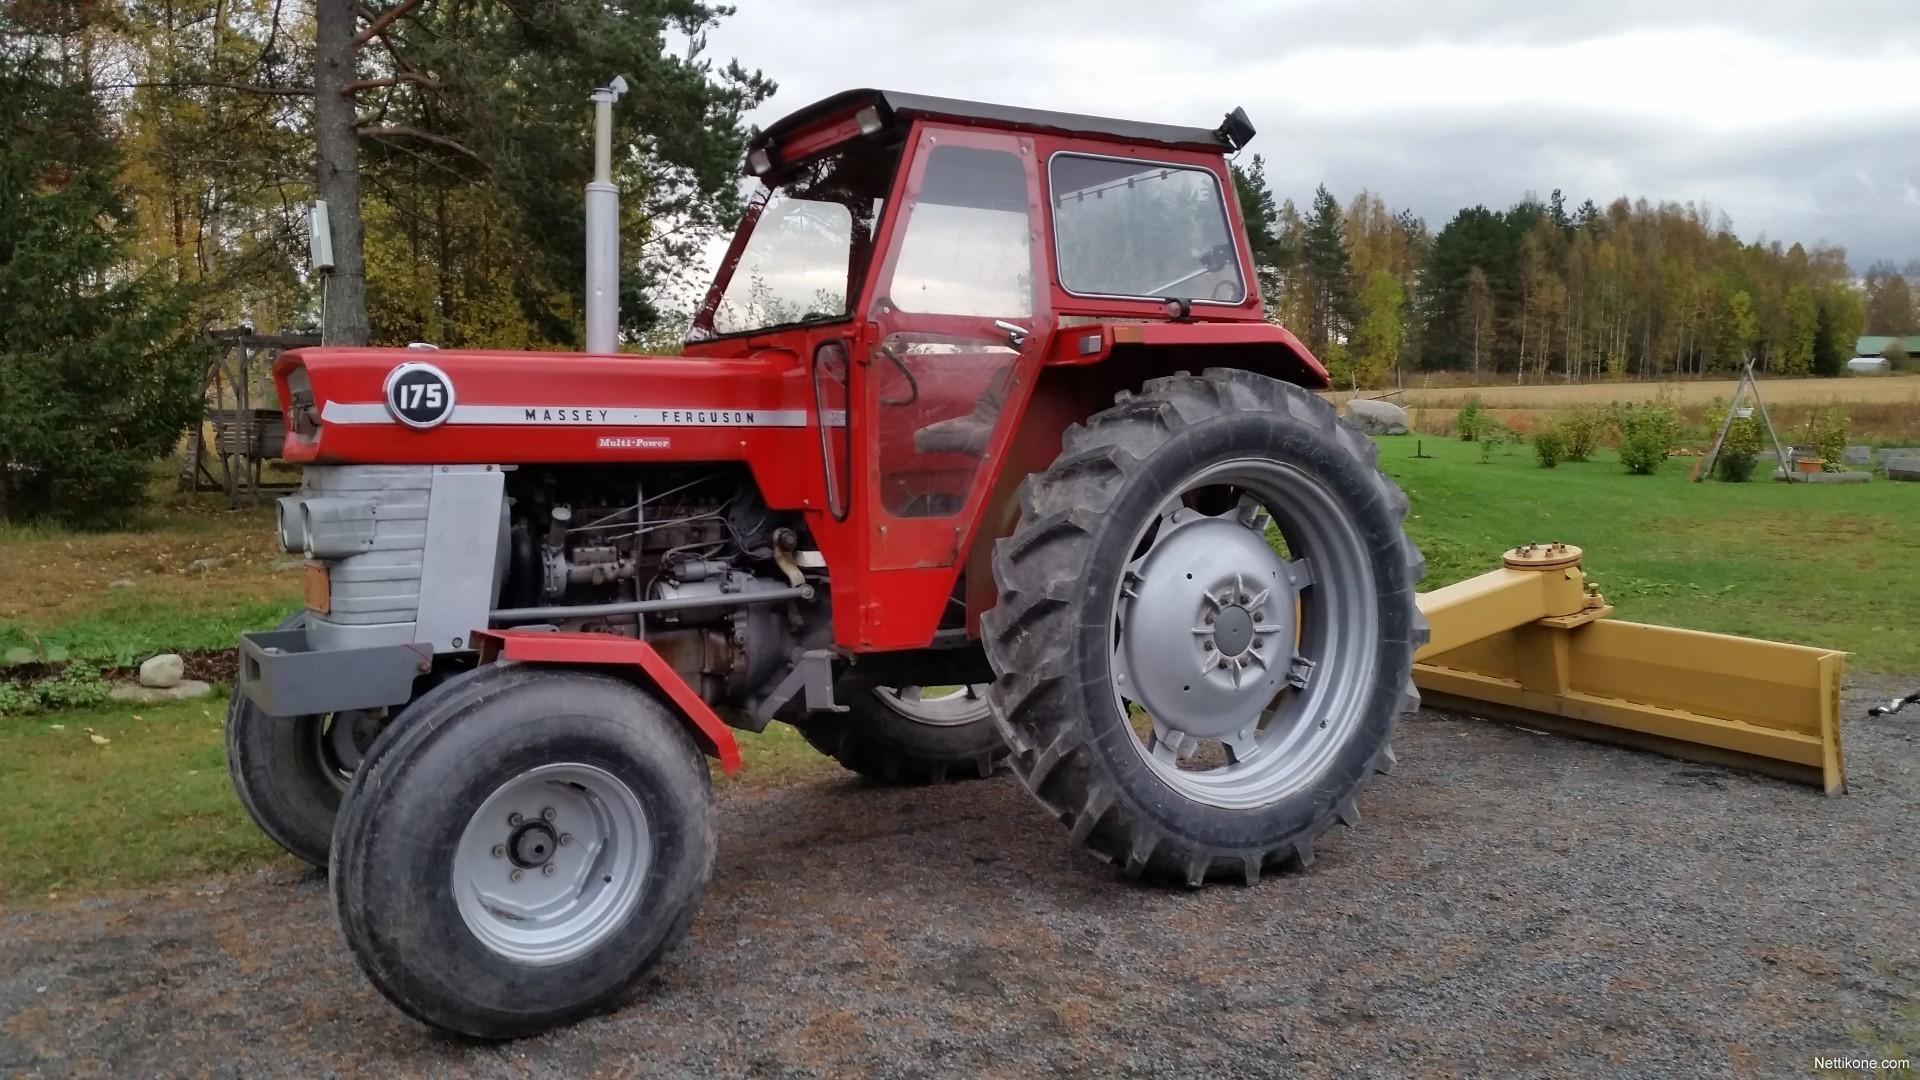 Massey 175 Diesel : Massey ferguson traktorit nettikone